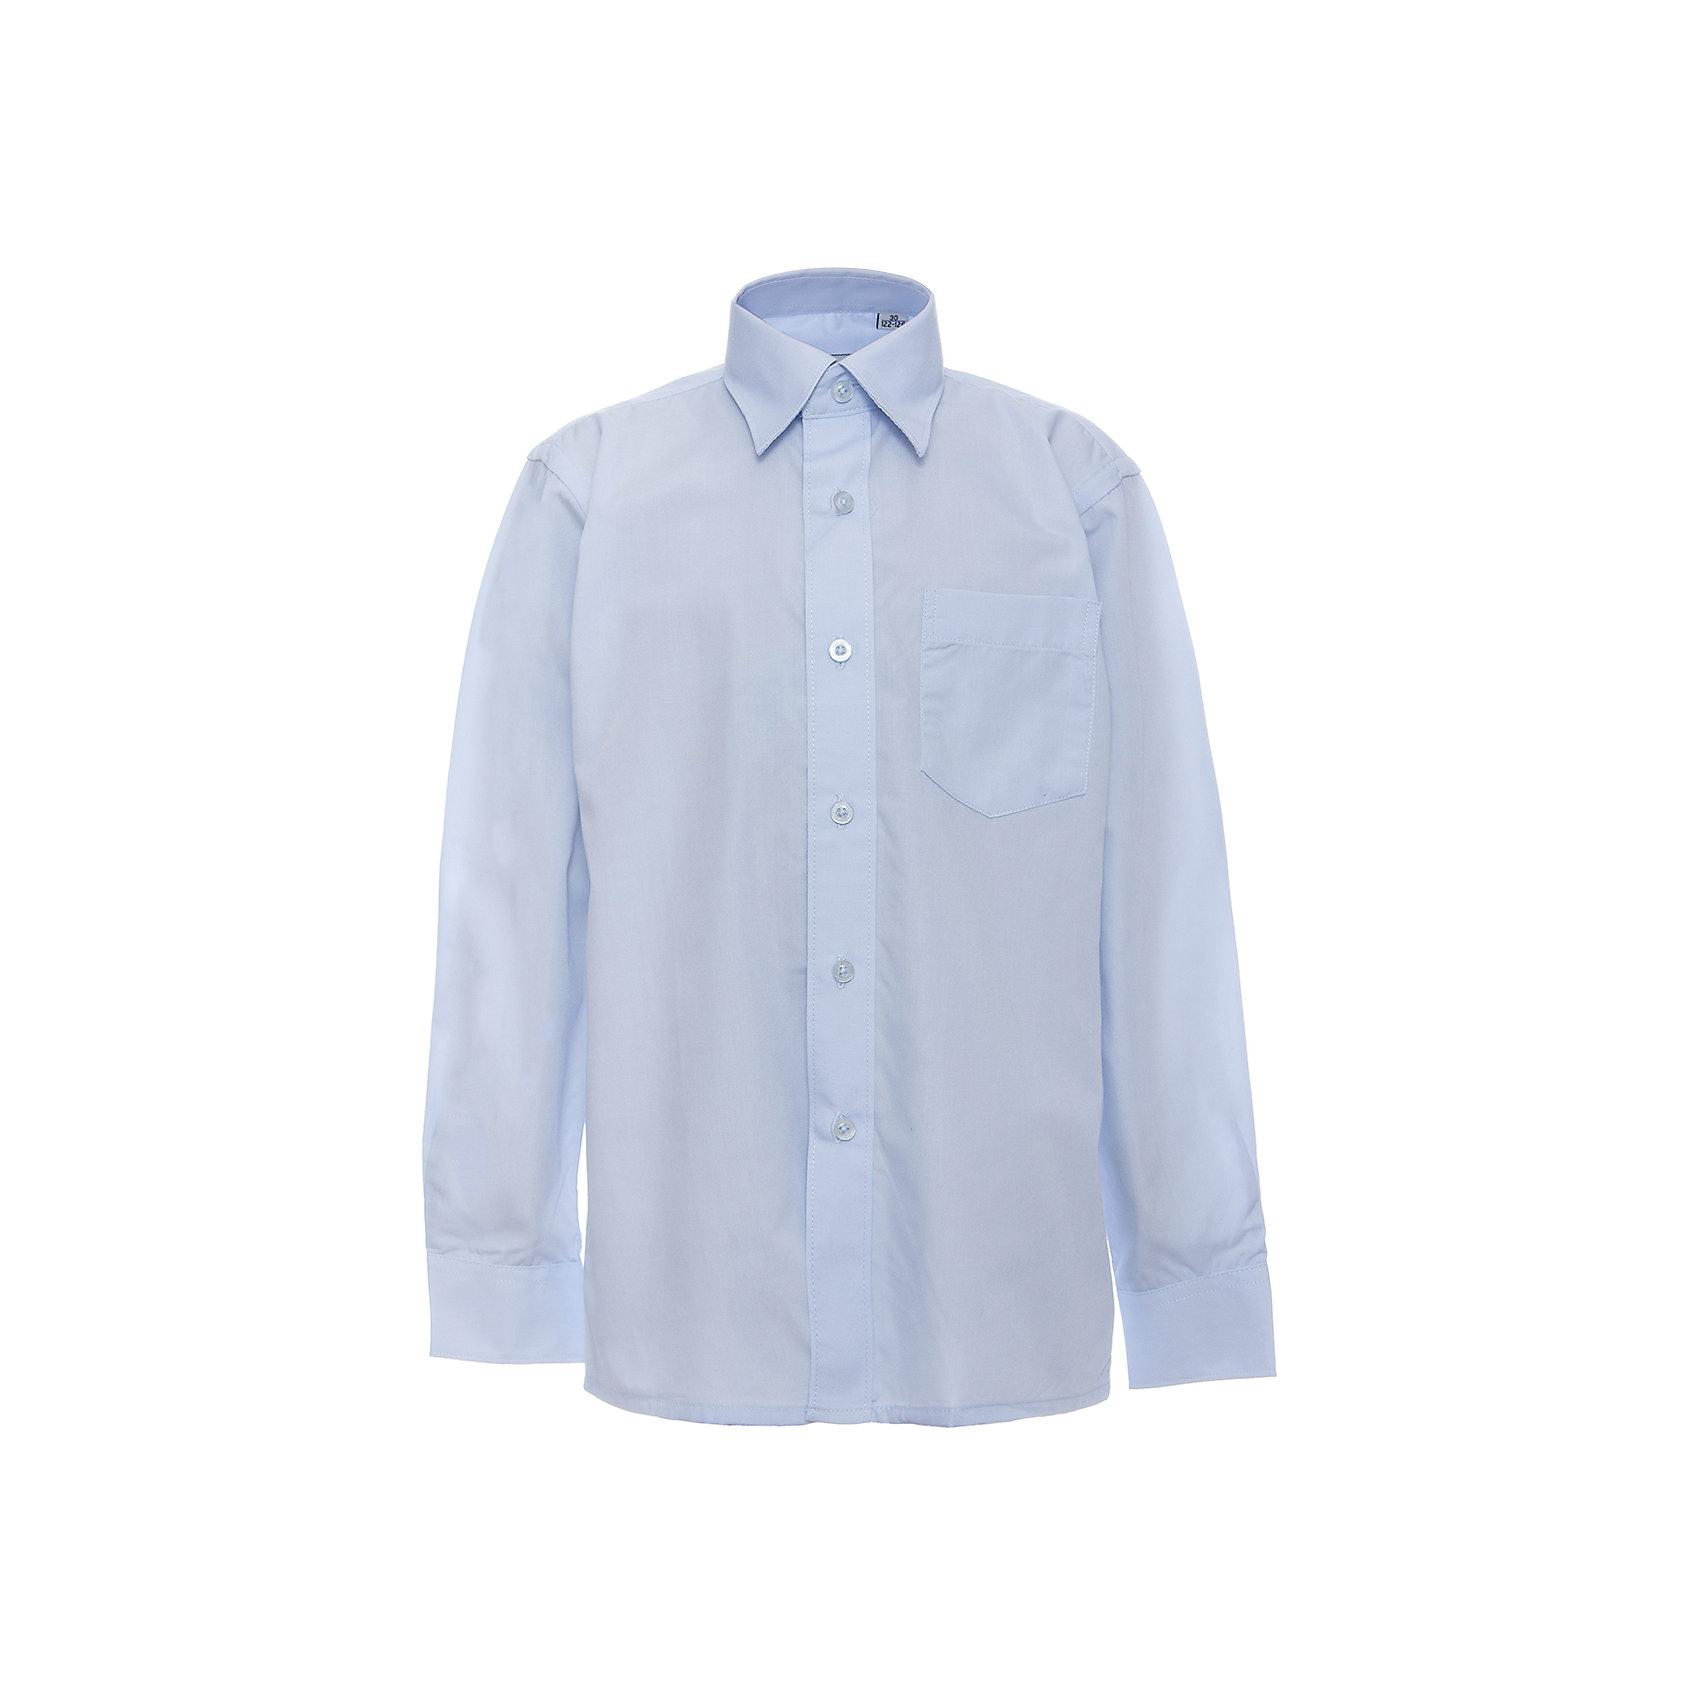 Рубашка для мальчика SkylakeБлузки и рубашки<br>Рубашка для мальчика от известного бренда Skylake.<br><br>Состав:<br>80% хлопок, 20% п/э<br><br>Ширина мм: 174<br>Глубина мм: 10<br>Высота мм: 169<br>Вес г: 157<br>Цвет: голубой<br>Возраст от месяцев: 72<br>Возраст до месяцев: 84<br>Пол: Мужской<br>Возраст: Детский<br>Размер: 122,158,128,134,140,146<br>SKU: 4723363